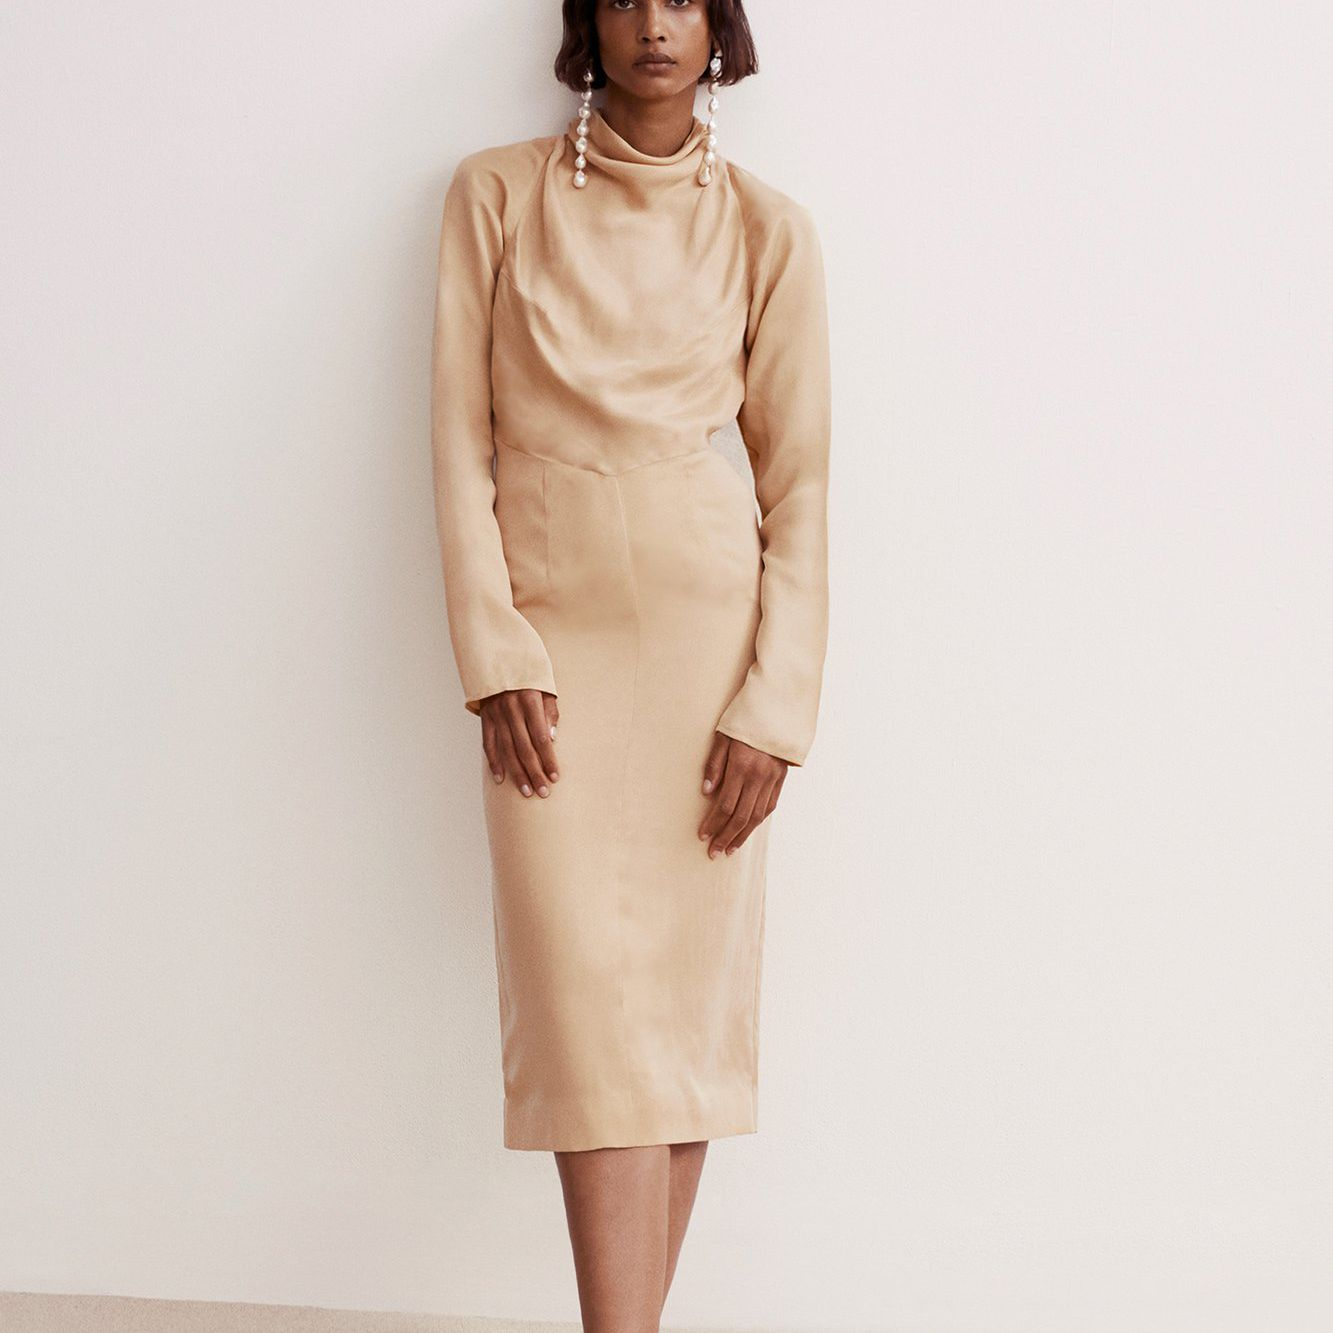 Tove Ines Cowl Buttermilk Cupro Dress $633